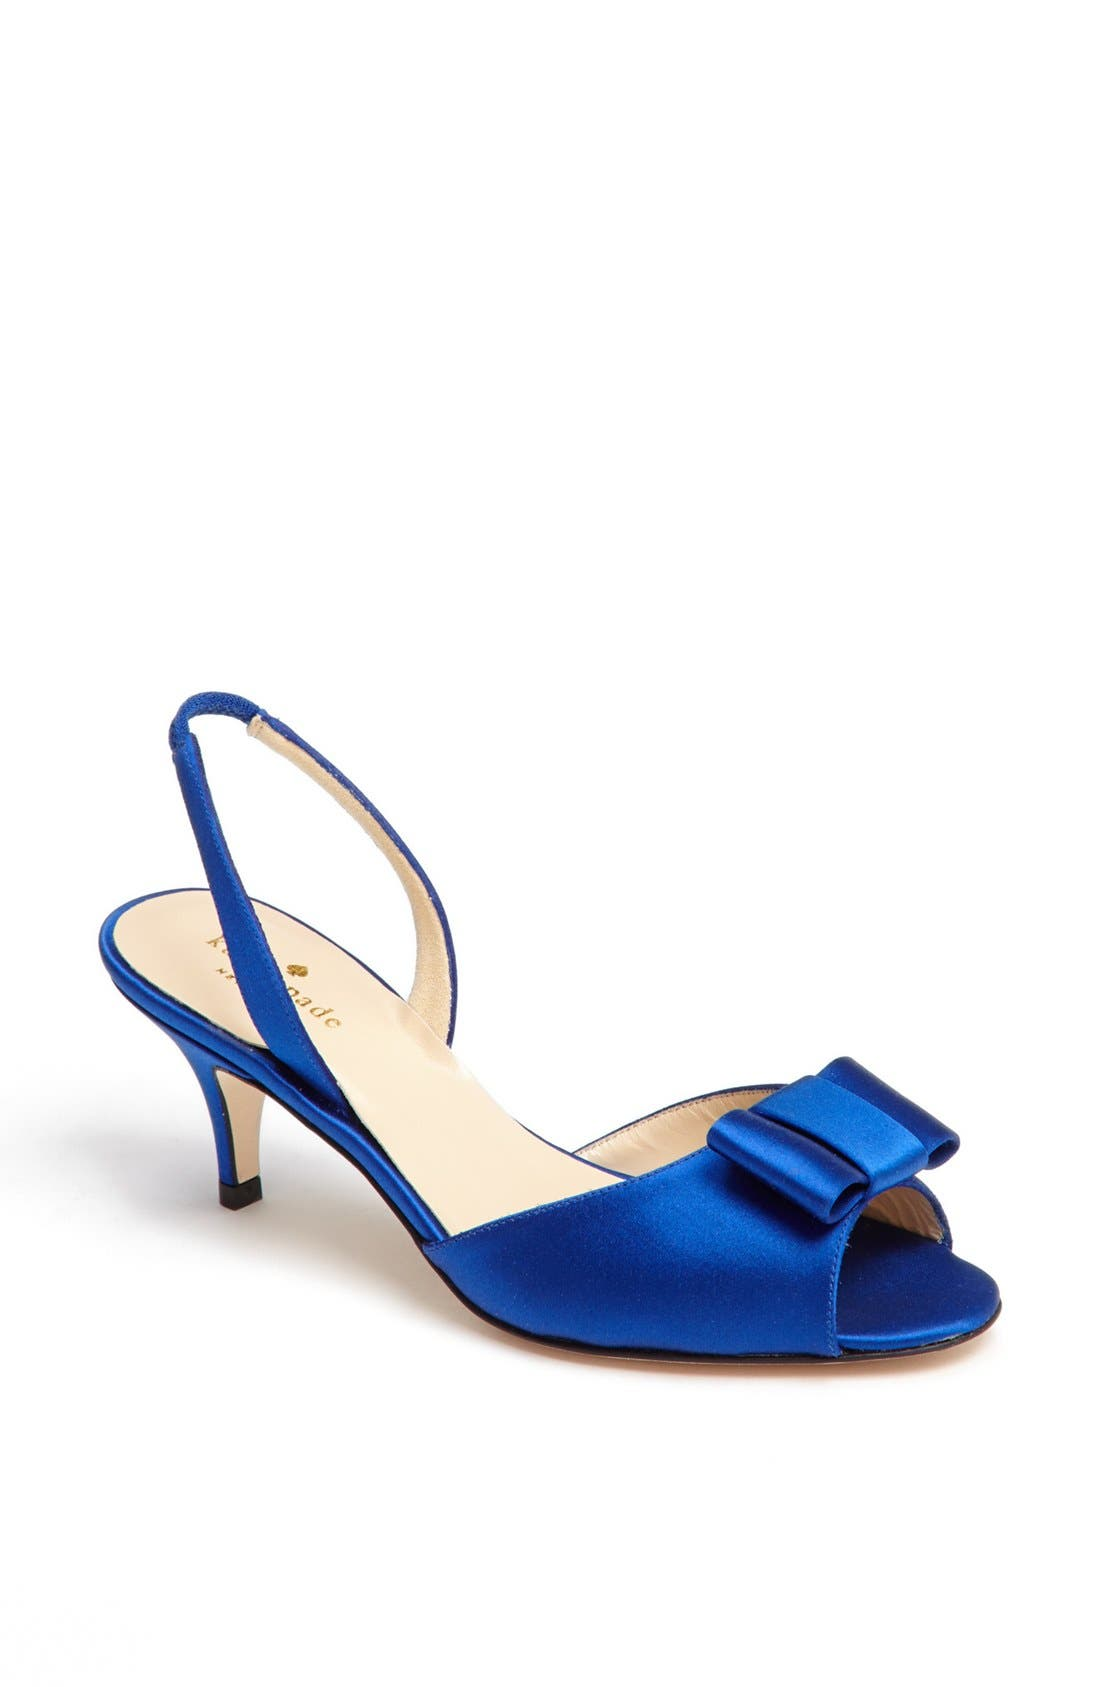 Alternate Image 1 Selected - kate spade new york 'emelia' sandal (Women)